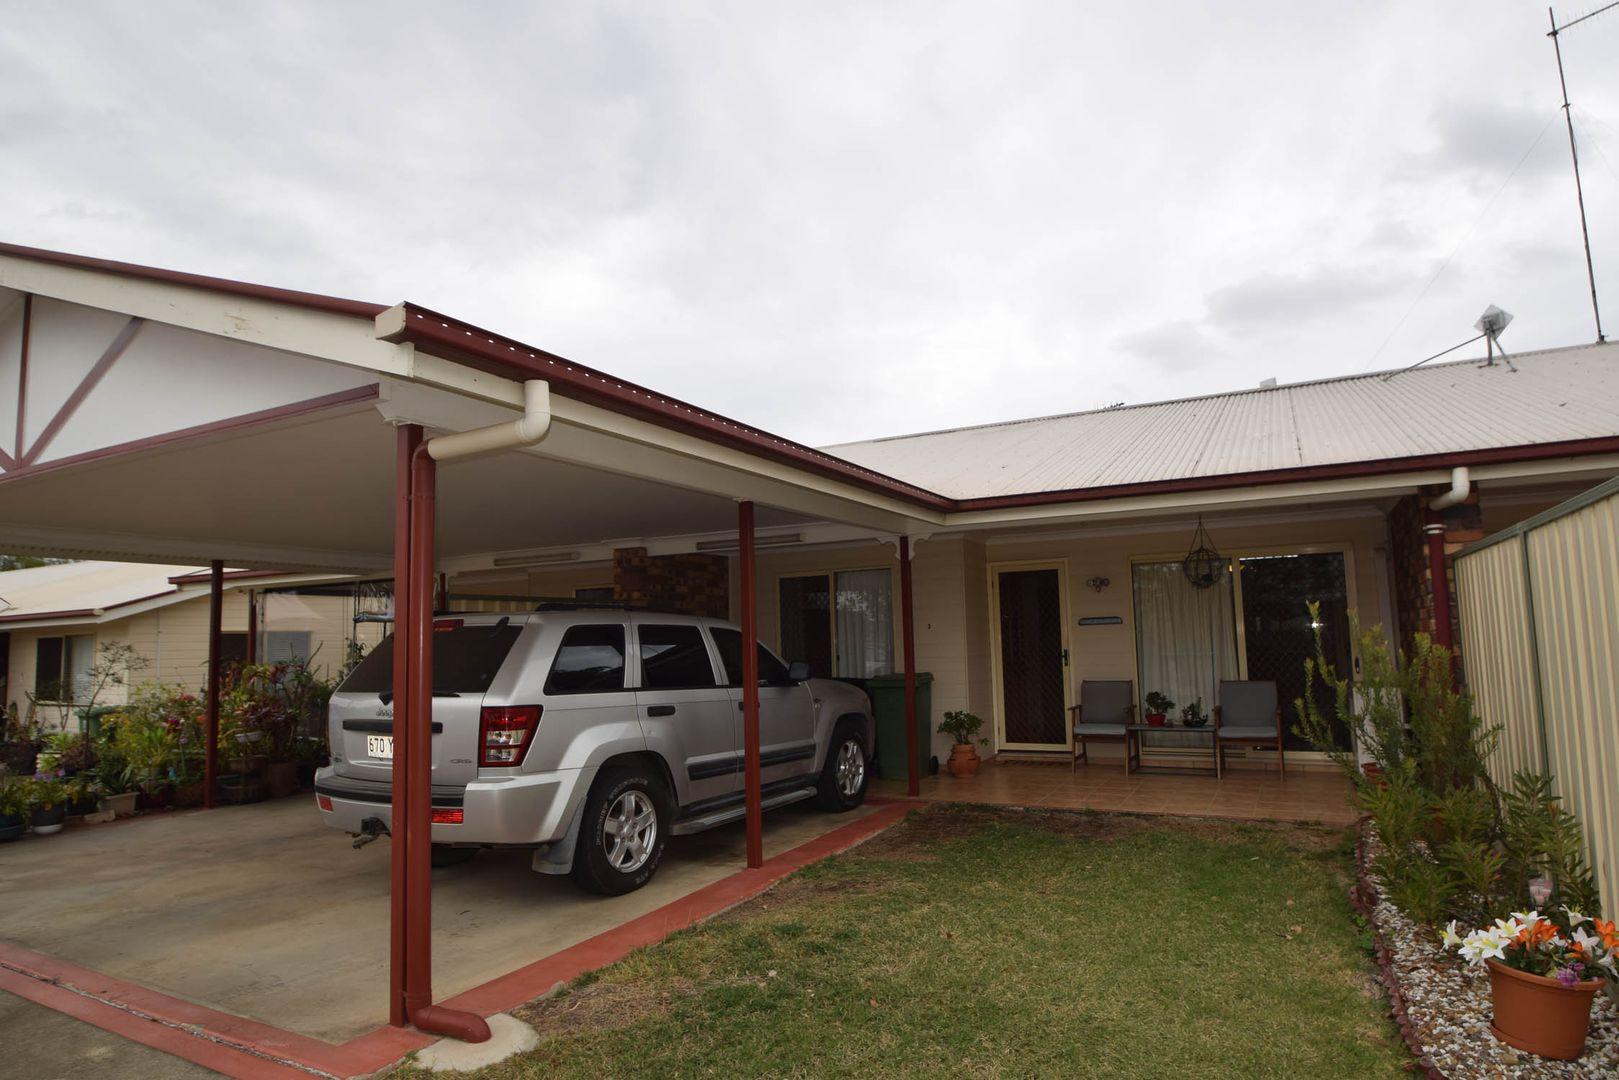 3/139 Cressbrook Street, Toogoolawah QLD 4313, Image 0